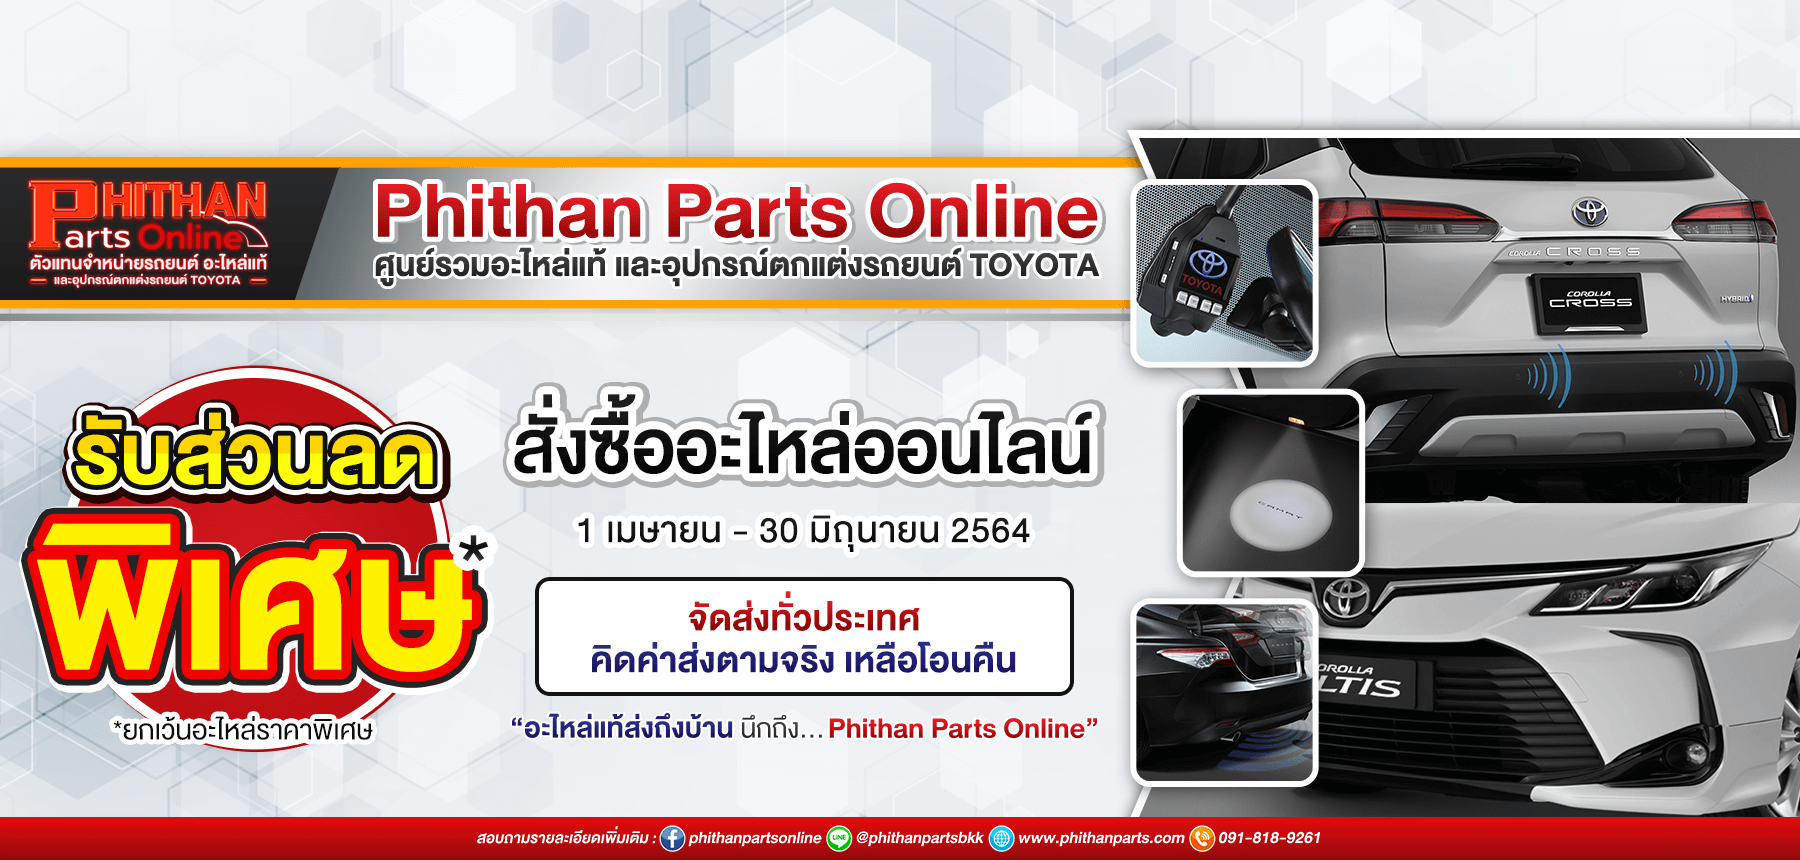 Phithan Parts Online ตัวแทนจำหน่ายรถยนต์ อะไหล่แท้ และอุปกรณ์ตกแต่งงรถยนต์โตโยต้า